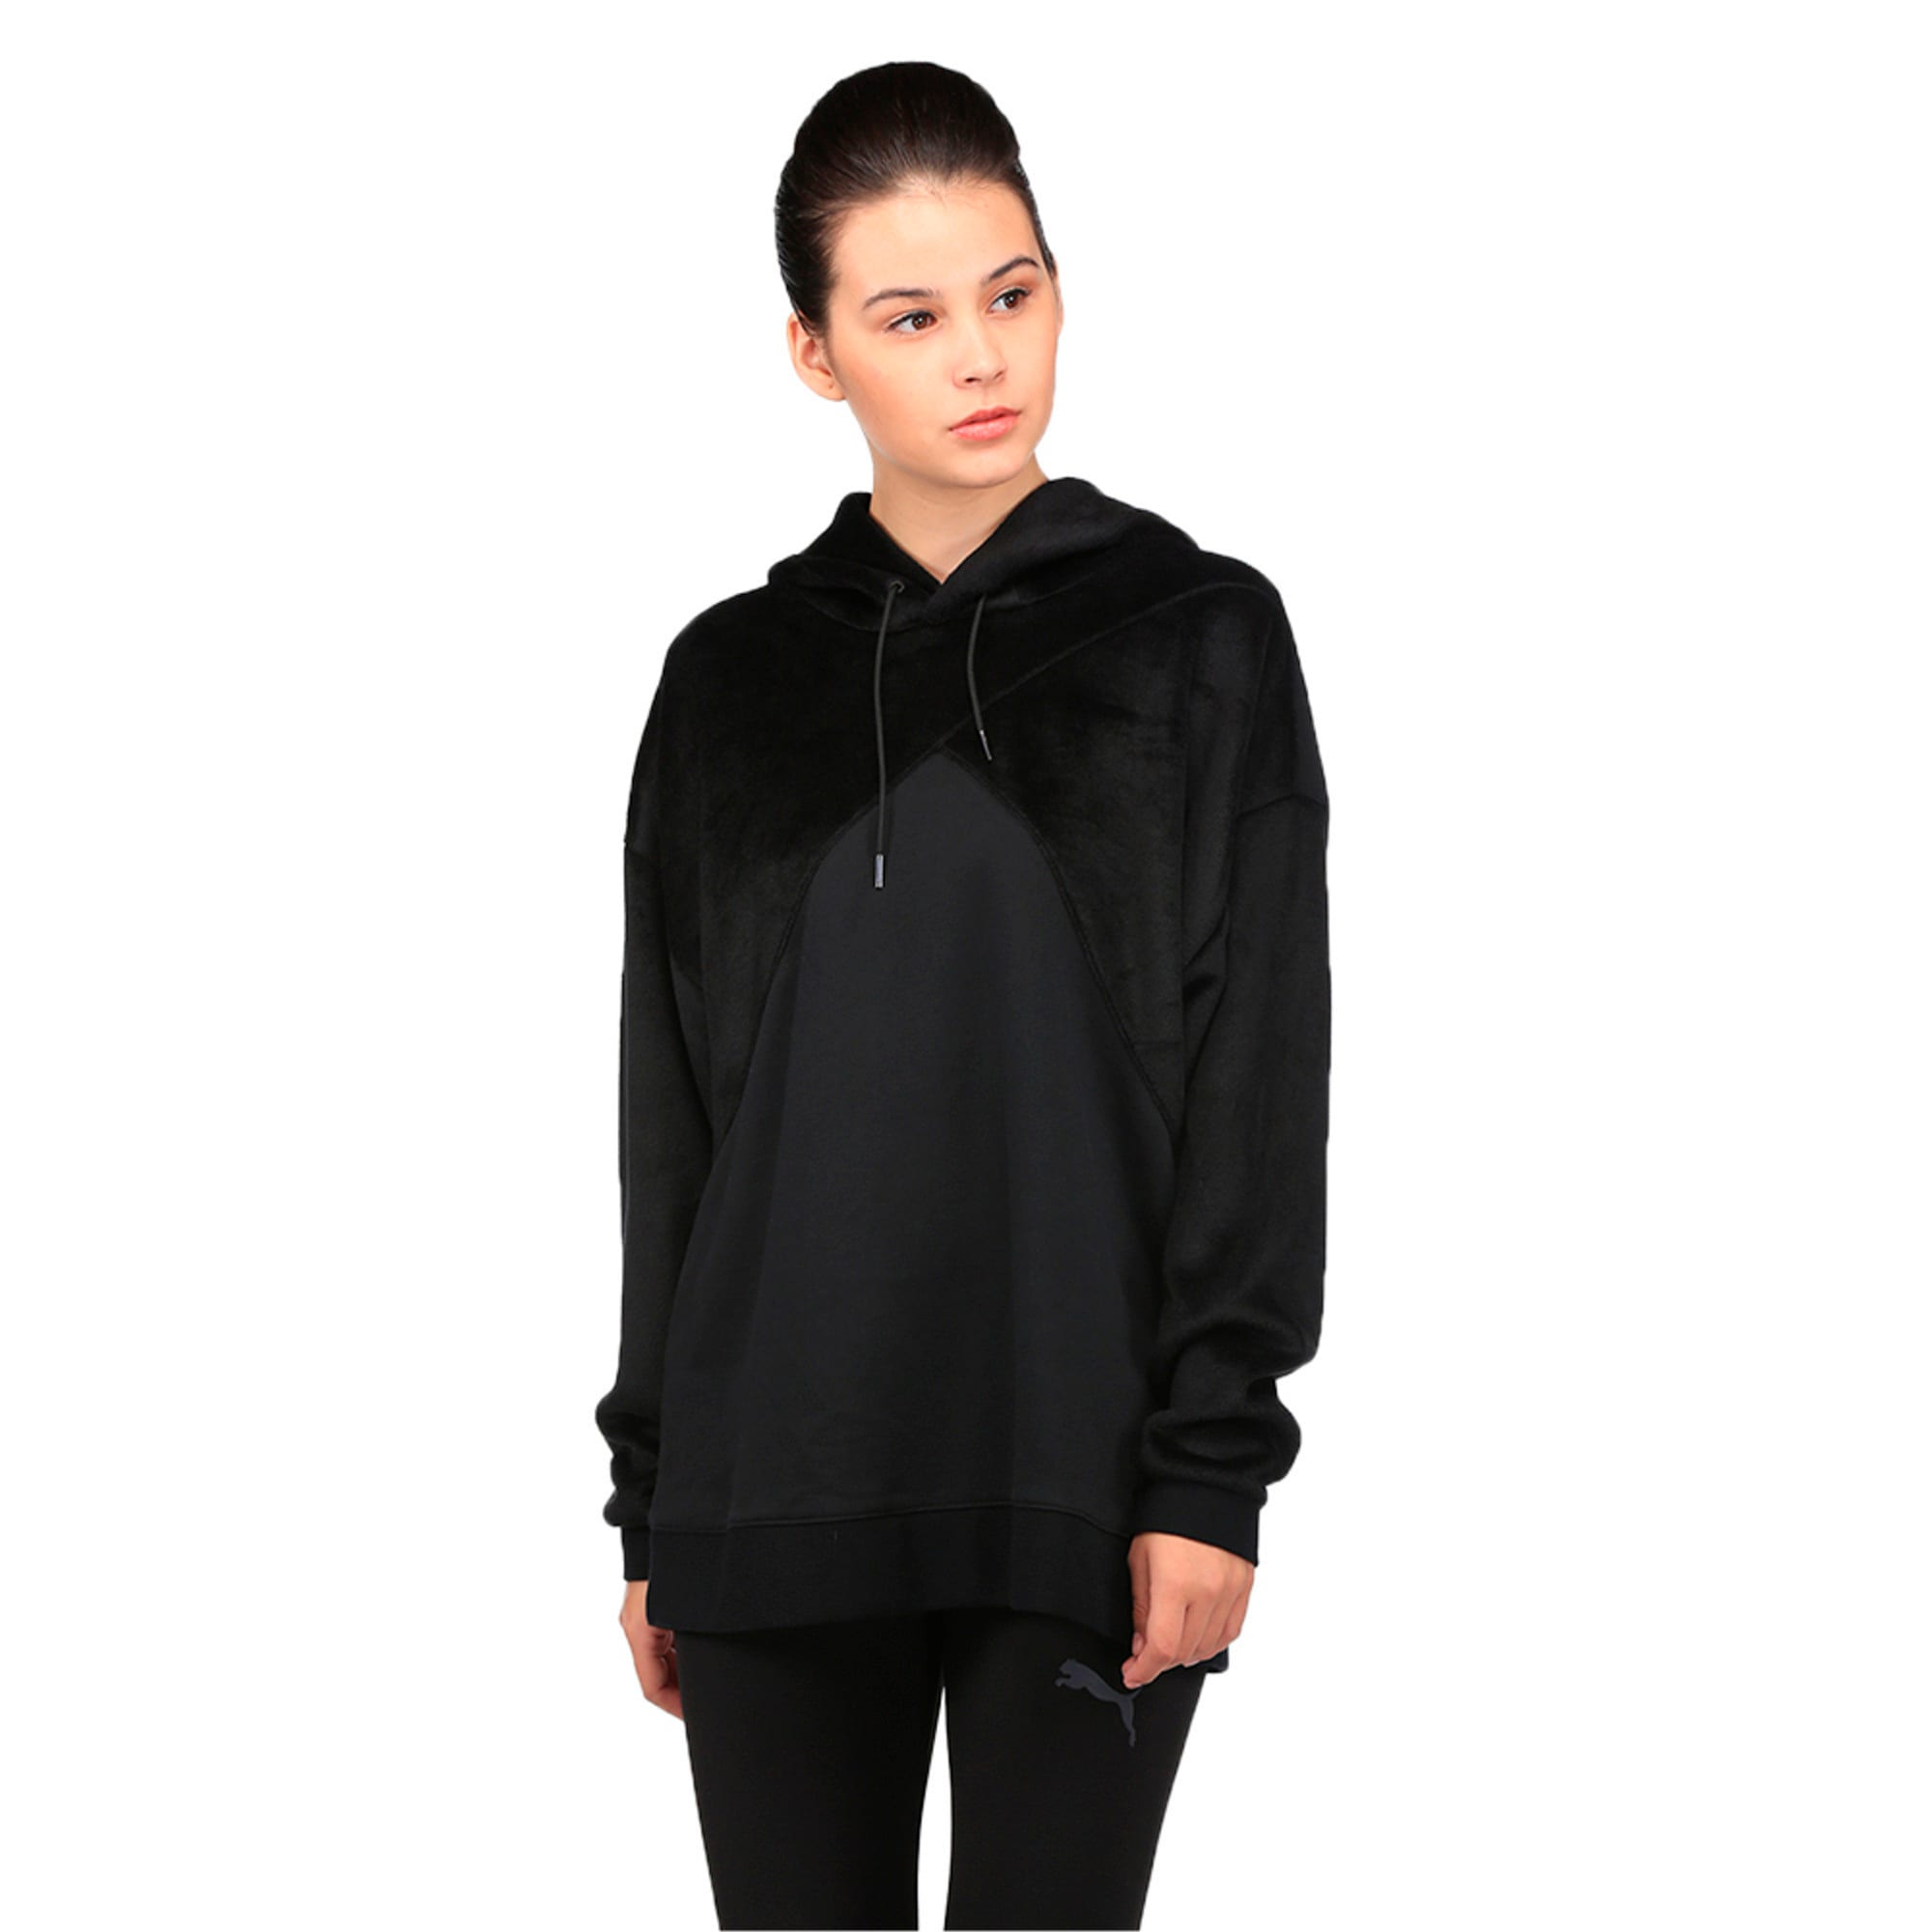 Thumbnail 2 of Archive Women's Fabric Block Oversized Hoodie, Puma Black, medium-IND